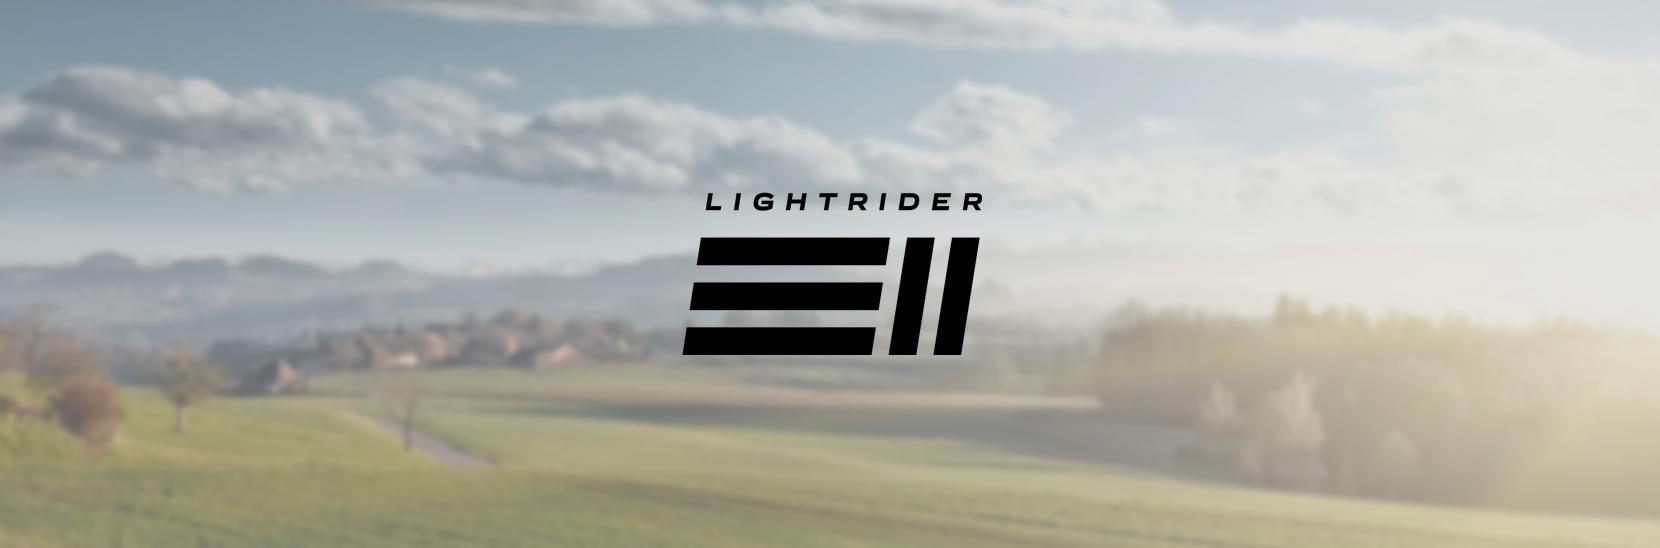 Thömus Lightrider E2 mit brandneuem Shimano EP8 Motor Thoemus neu  Akku